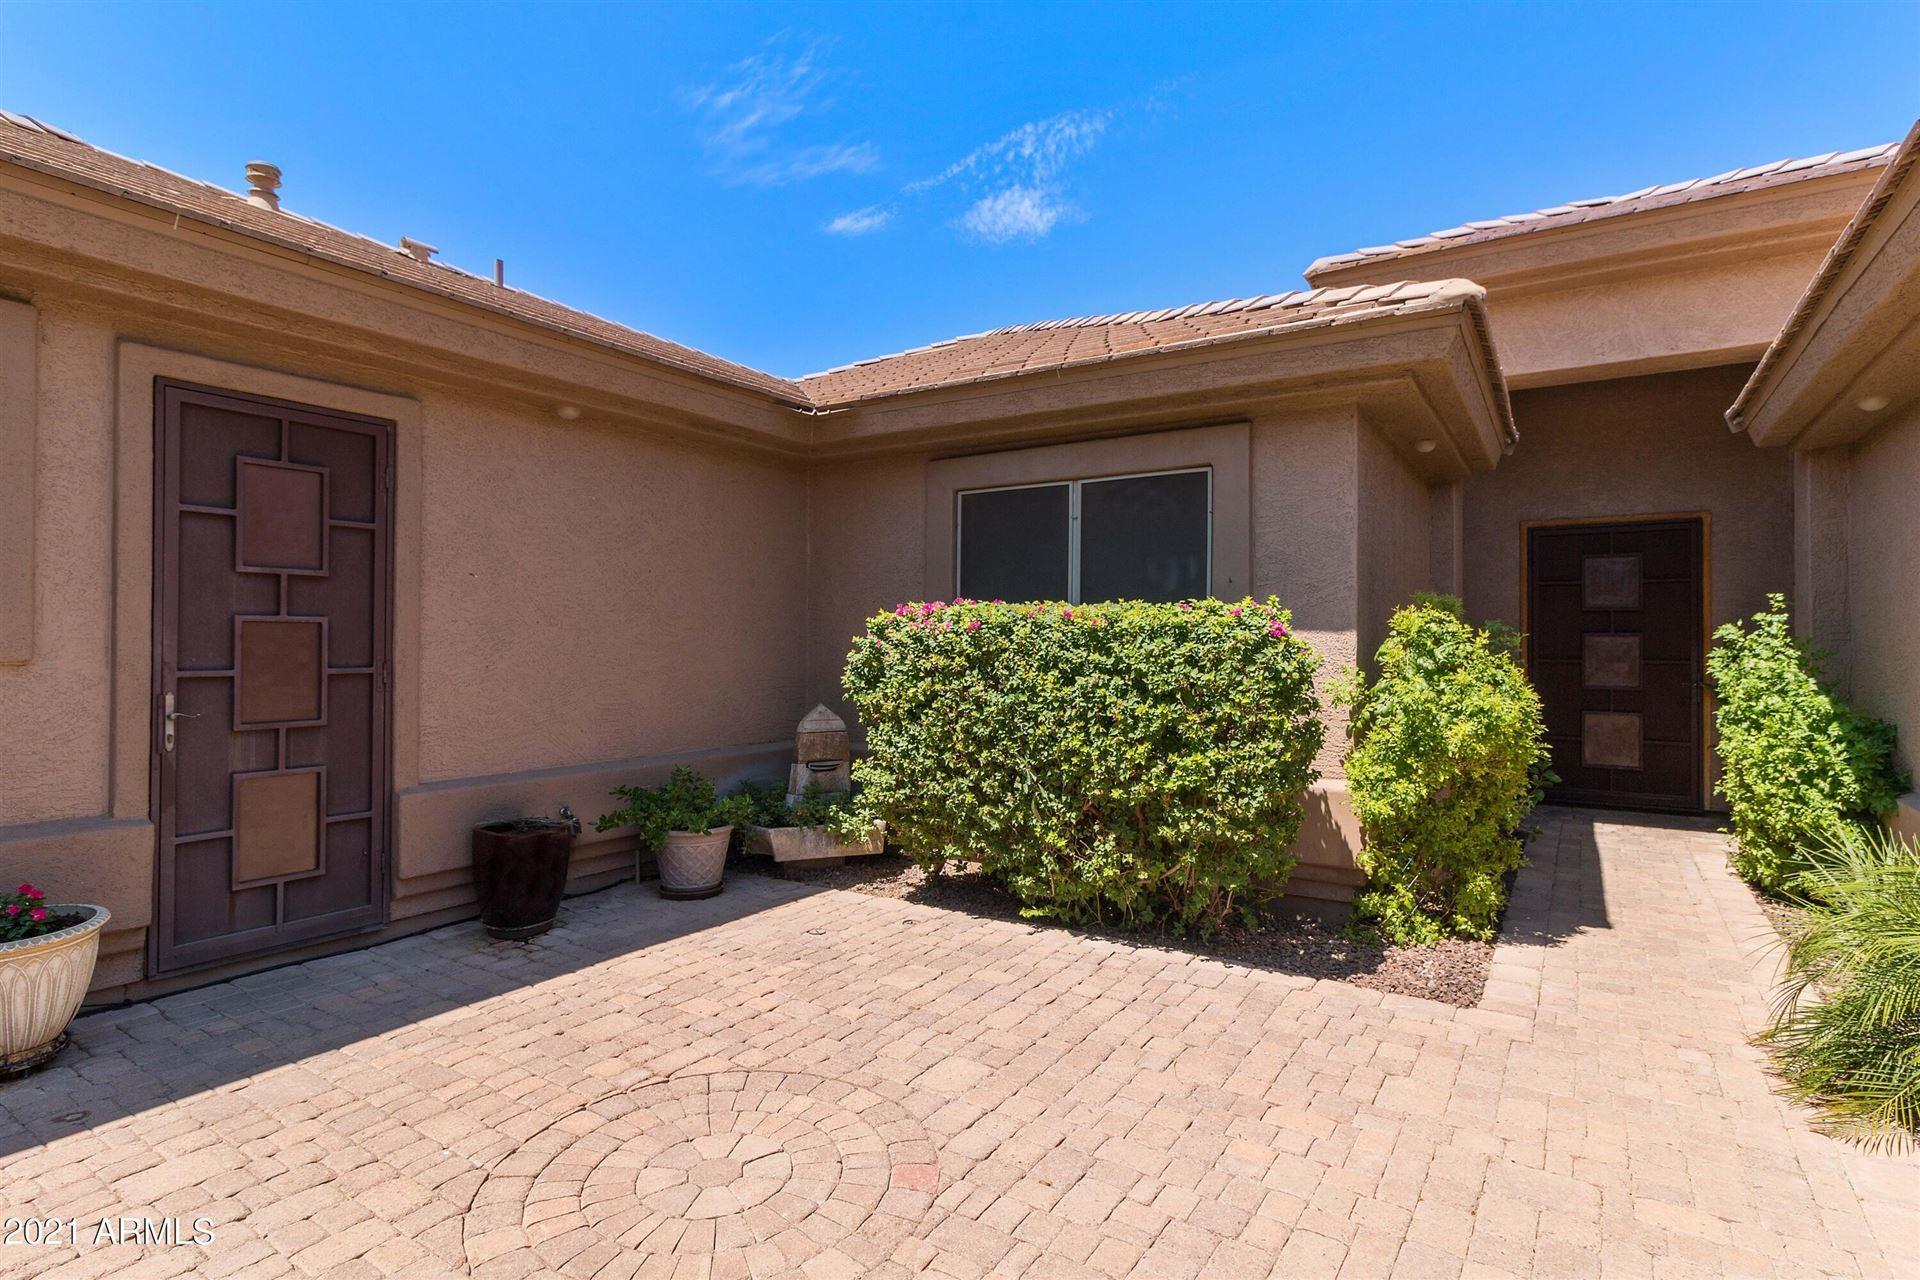 Photo of 5322 N 130TH Avenue, Litchfield Park, AZ 85340 (MLS # 6267010)